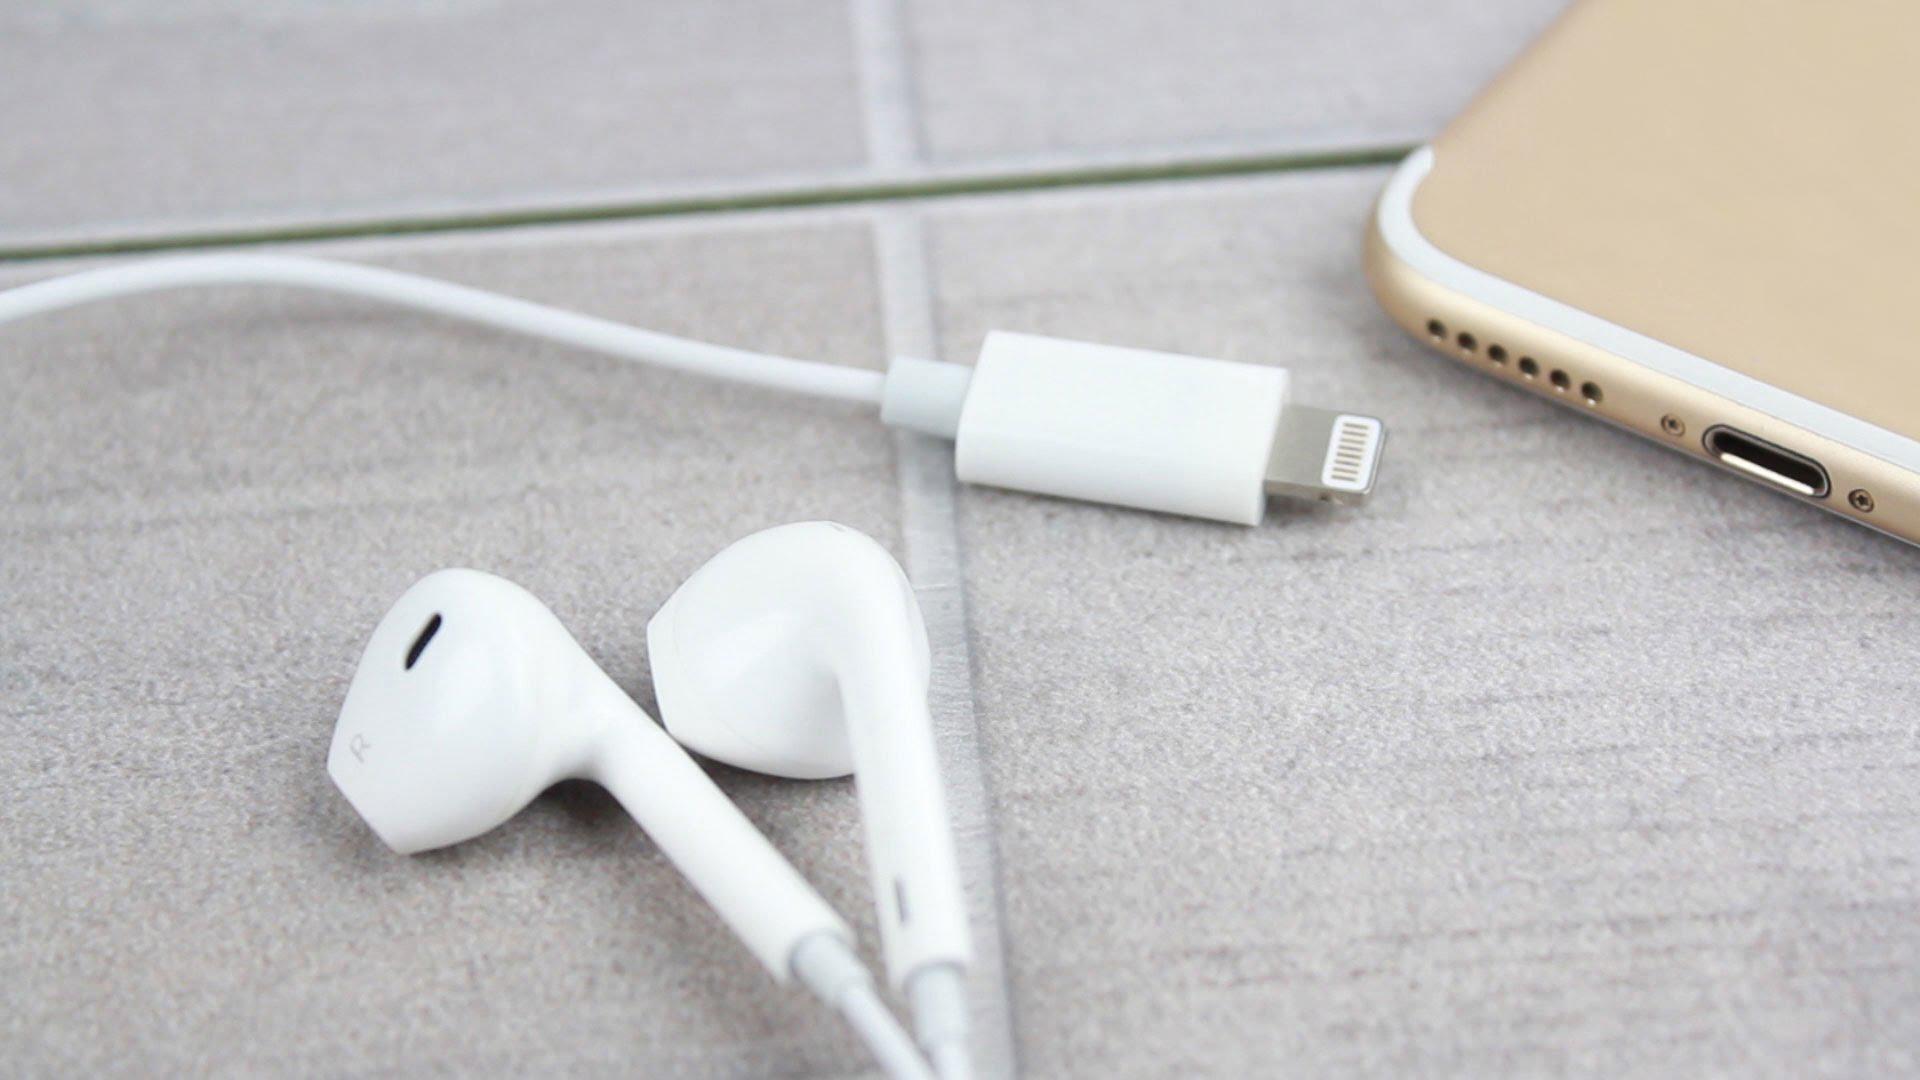 Think Apple - Slúchadlá Apple EarPods s Lightning konektorom na HD videu 1f28aa6fad9